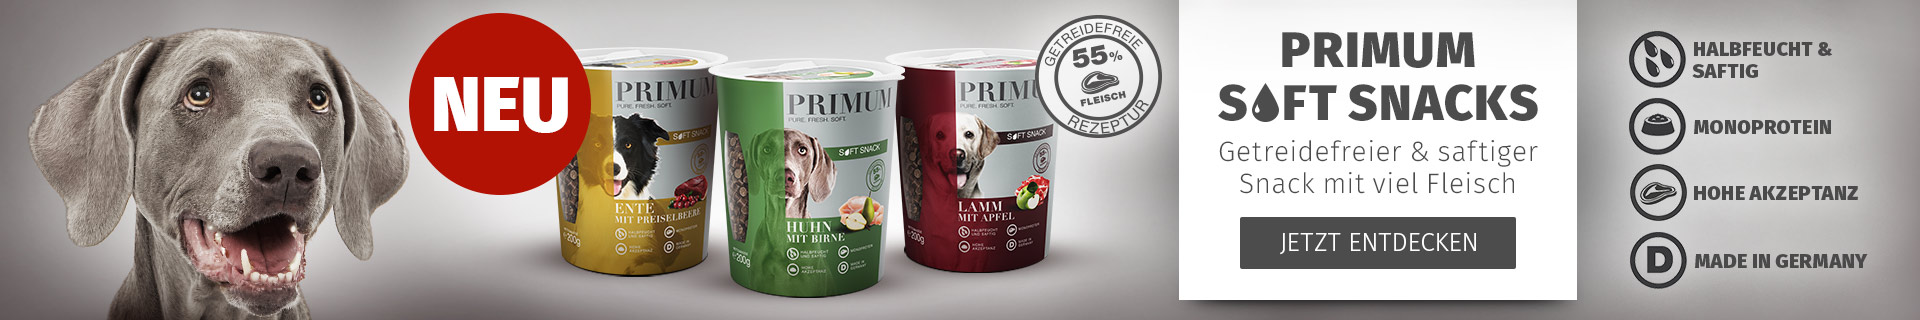 PRIMUM - Jetzt neu: Soft Snacks für Hunde